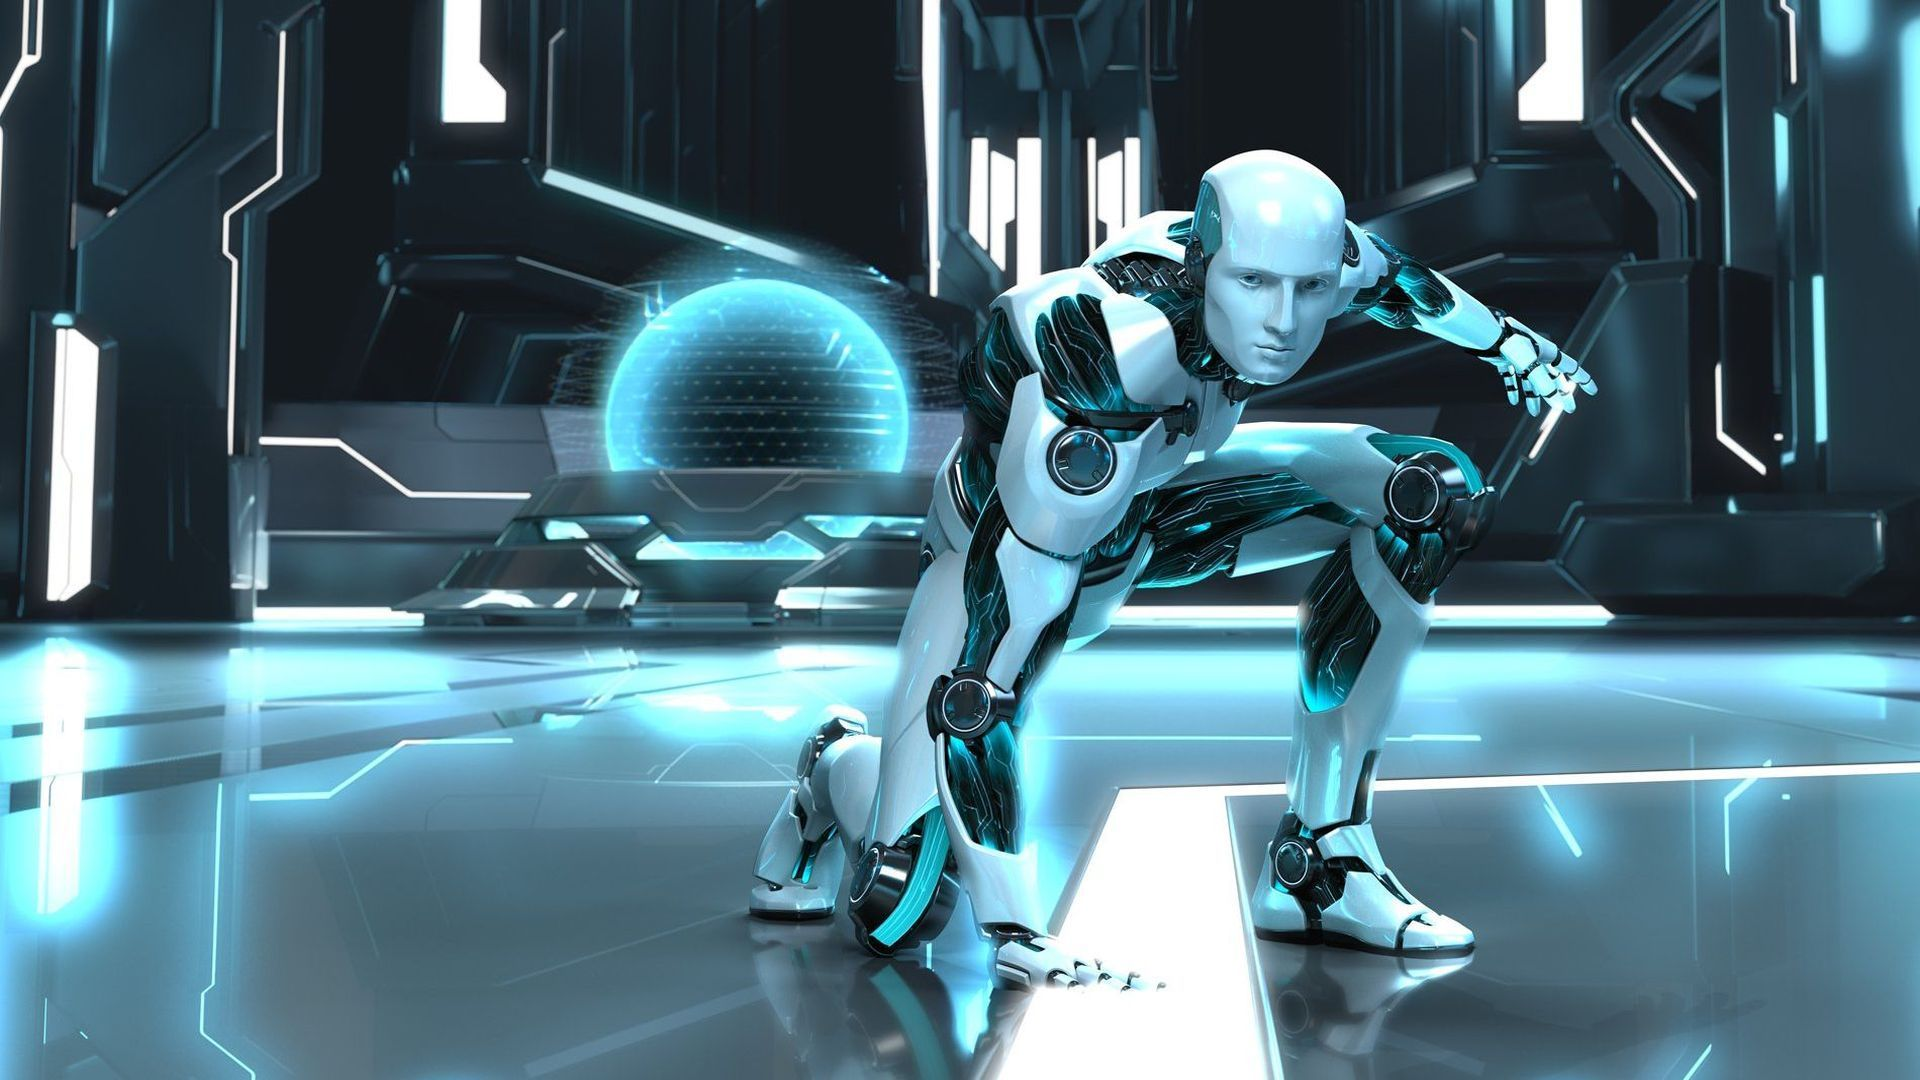 Sci Fi - Robot Wallpaper